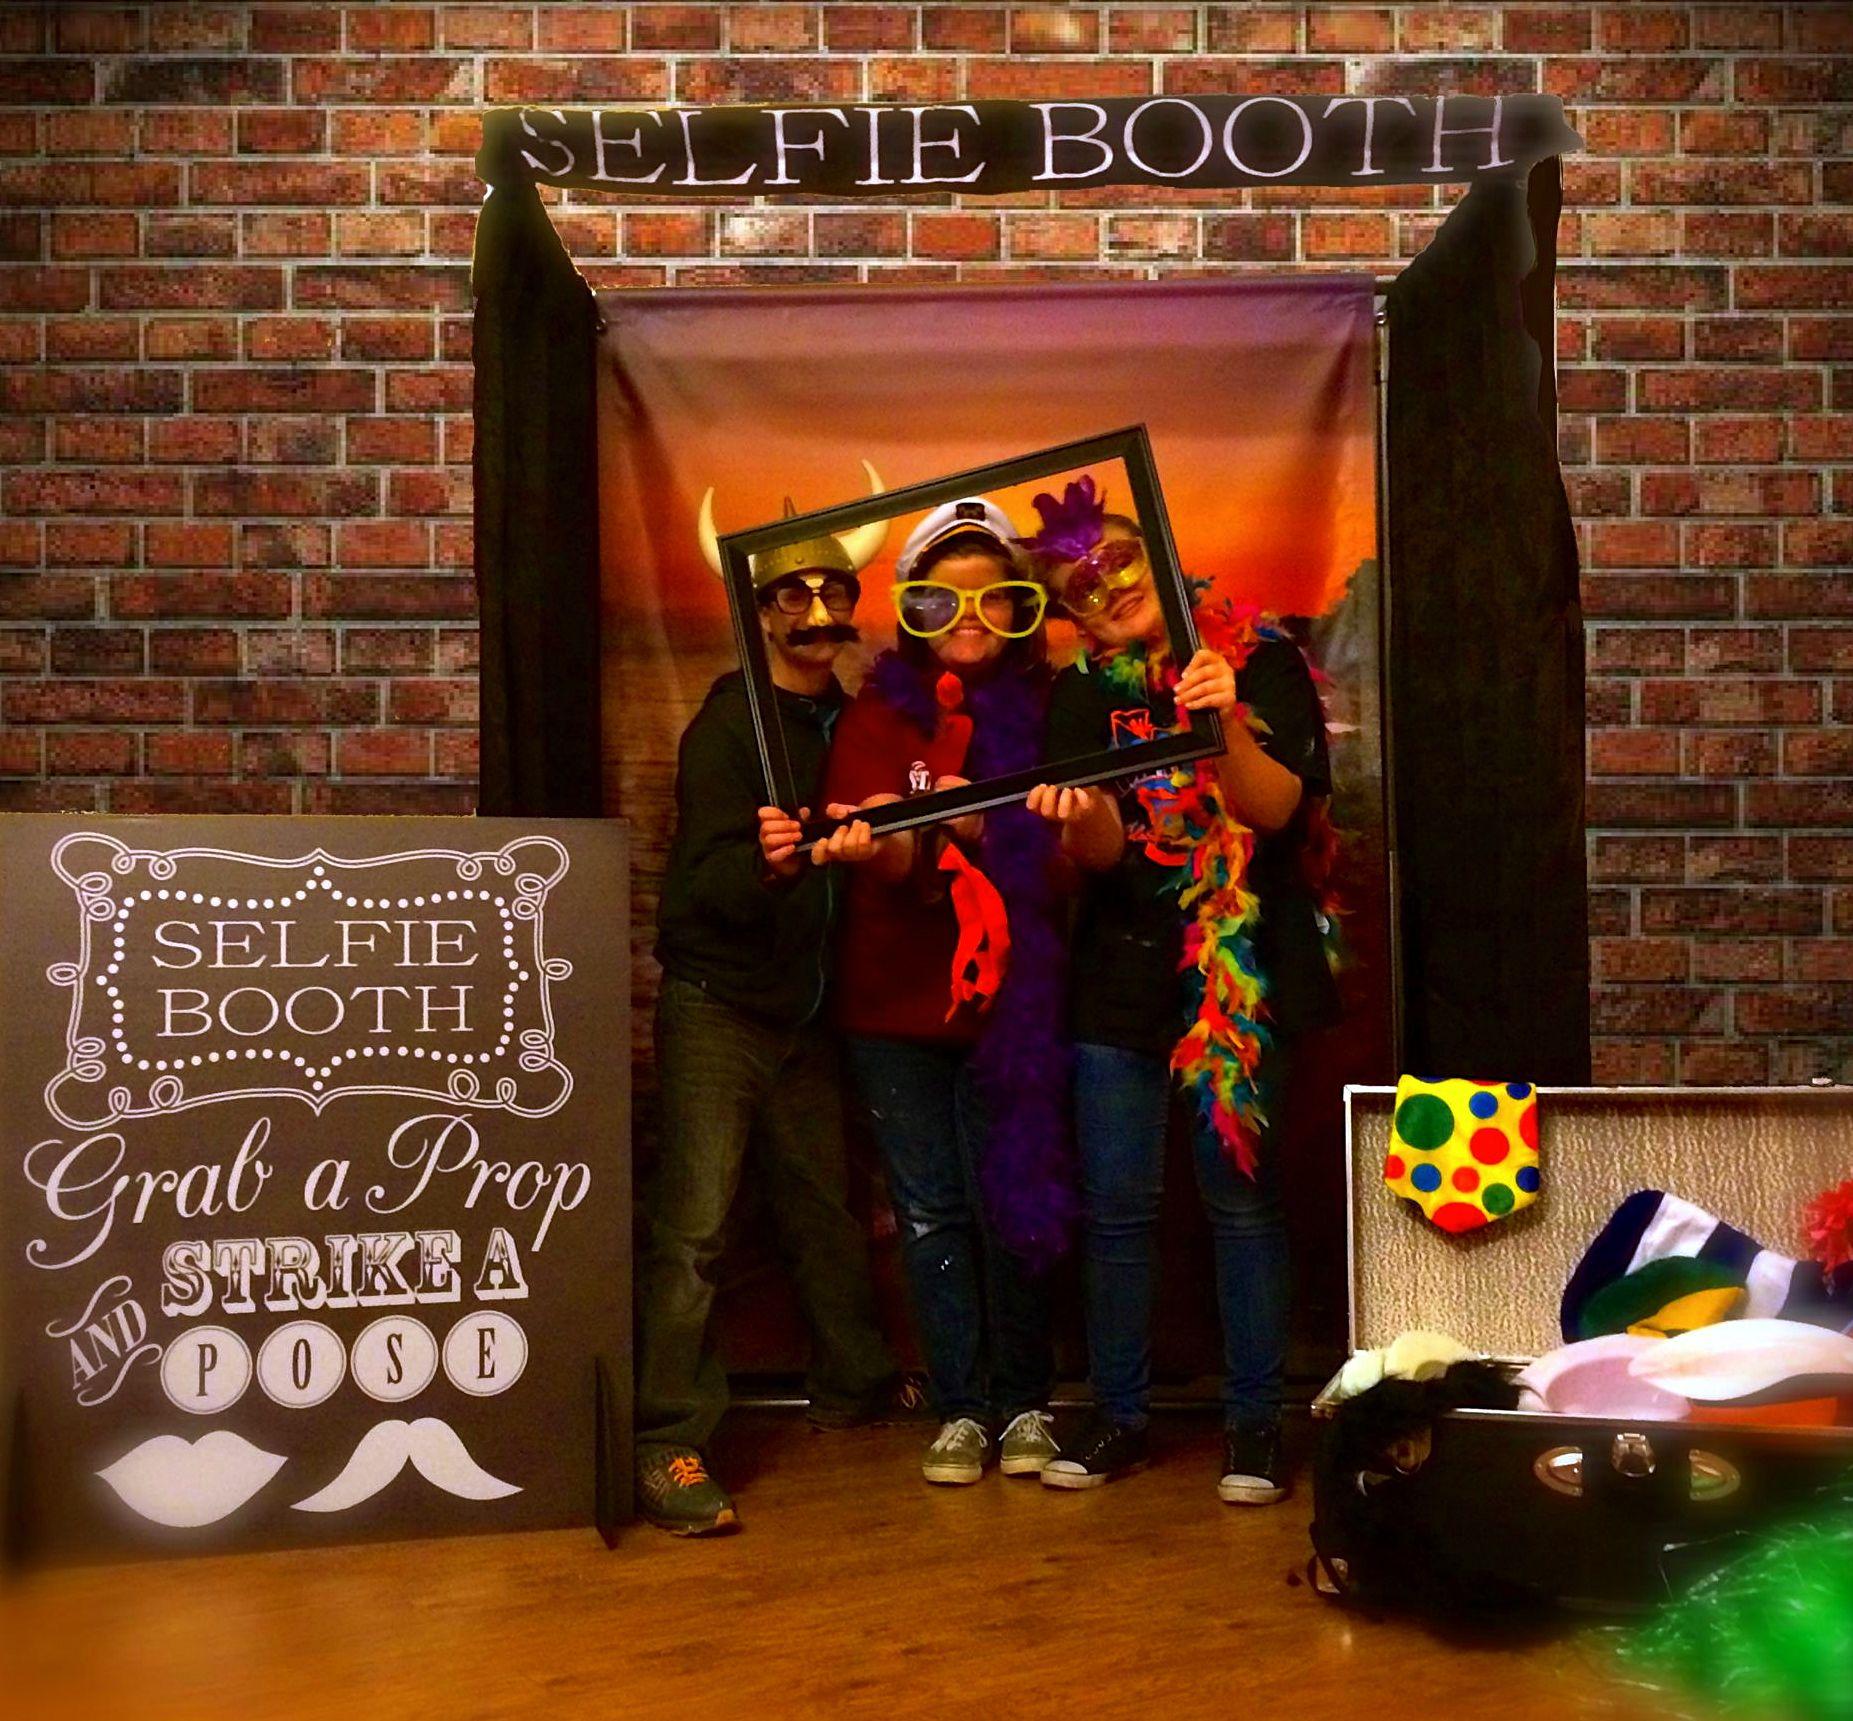 selfie booth wedding supplies fraser valley party rentals. Black Bedroom Furniture Sets. Home Design Ideas